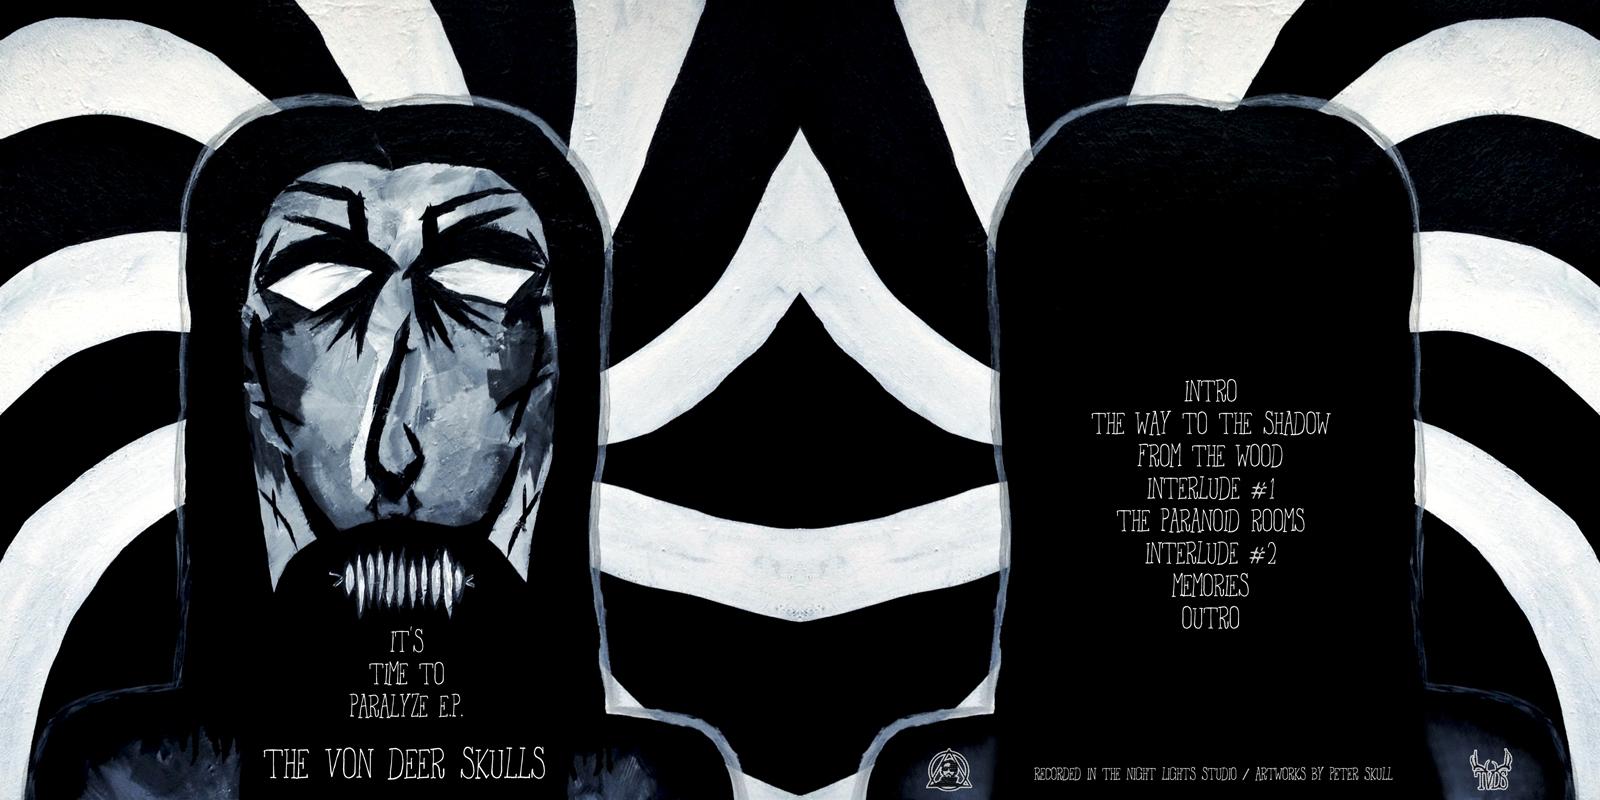 The Von Deer Skulls - It's Time To Paralyze E.P.